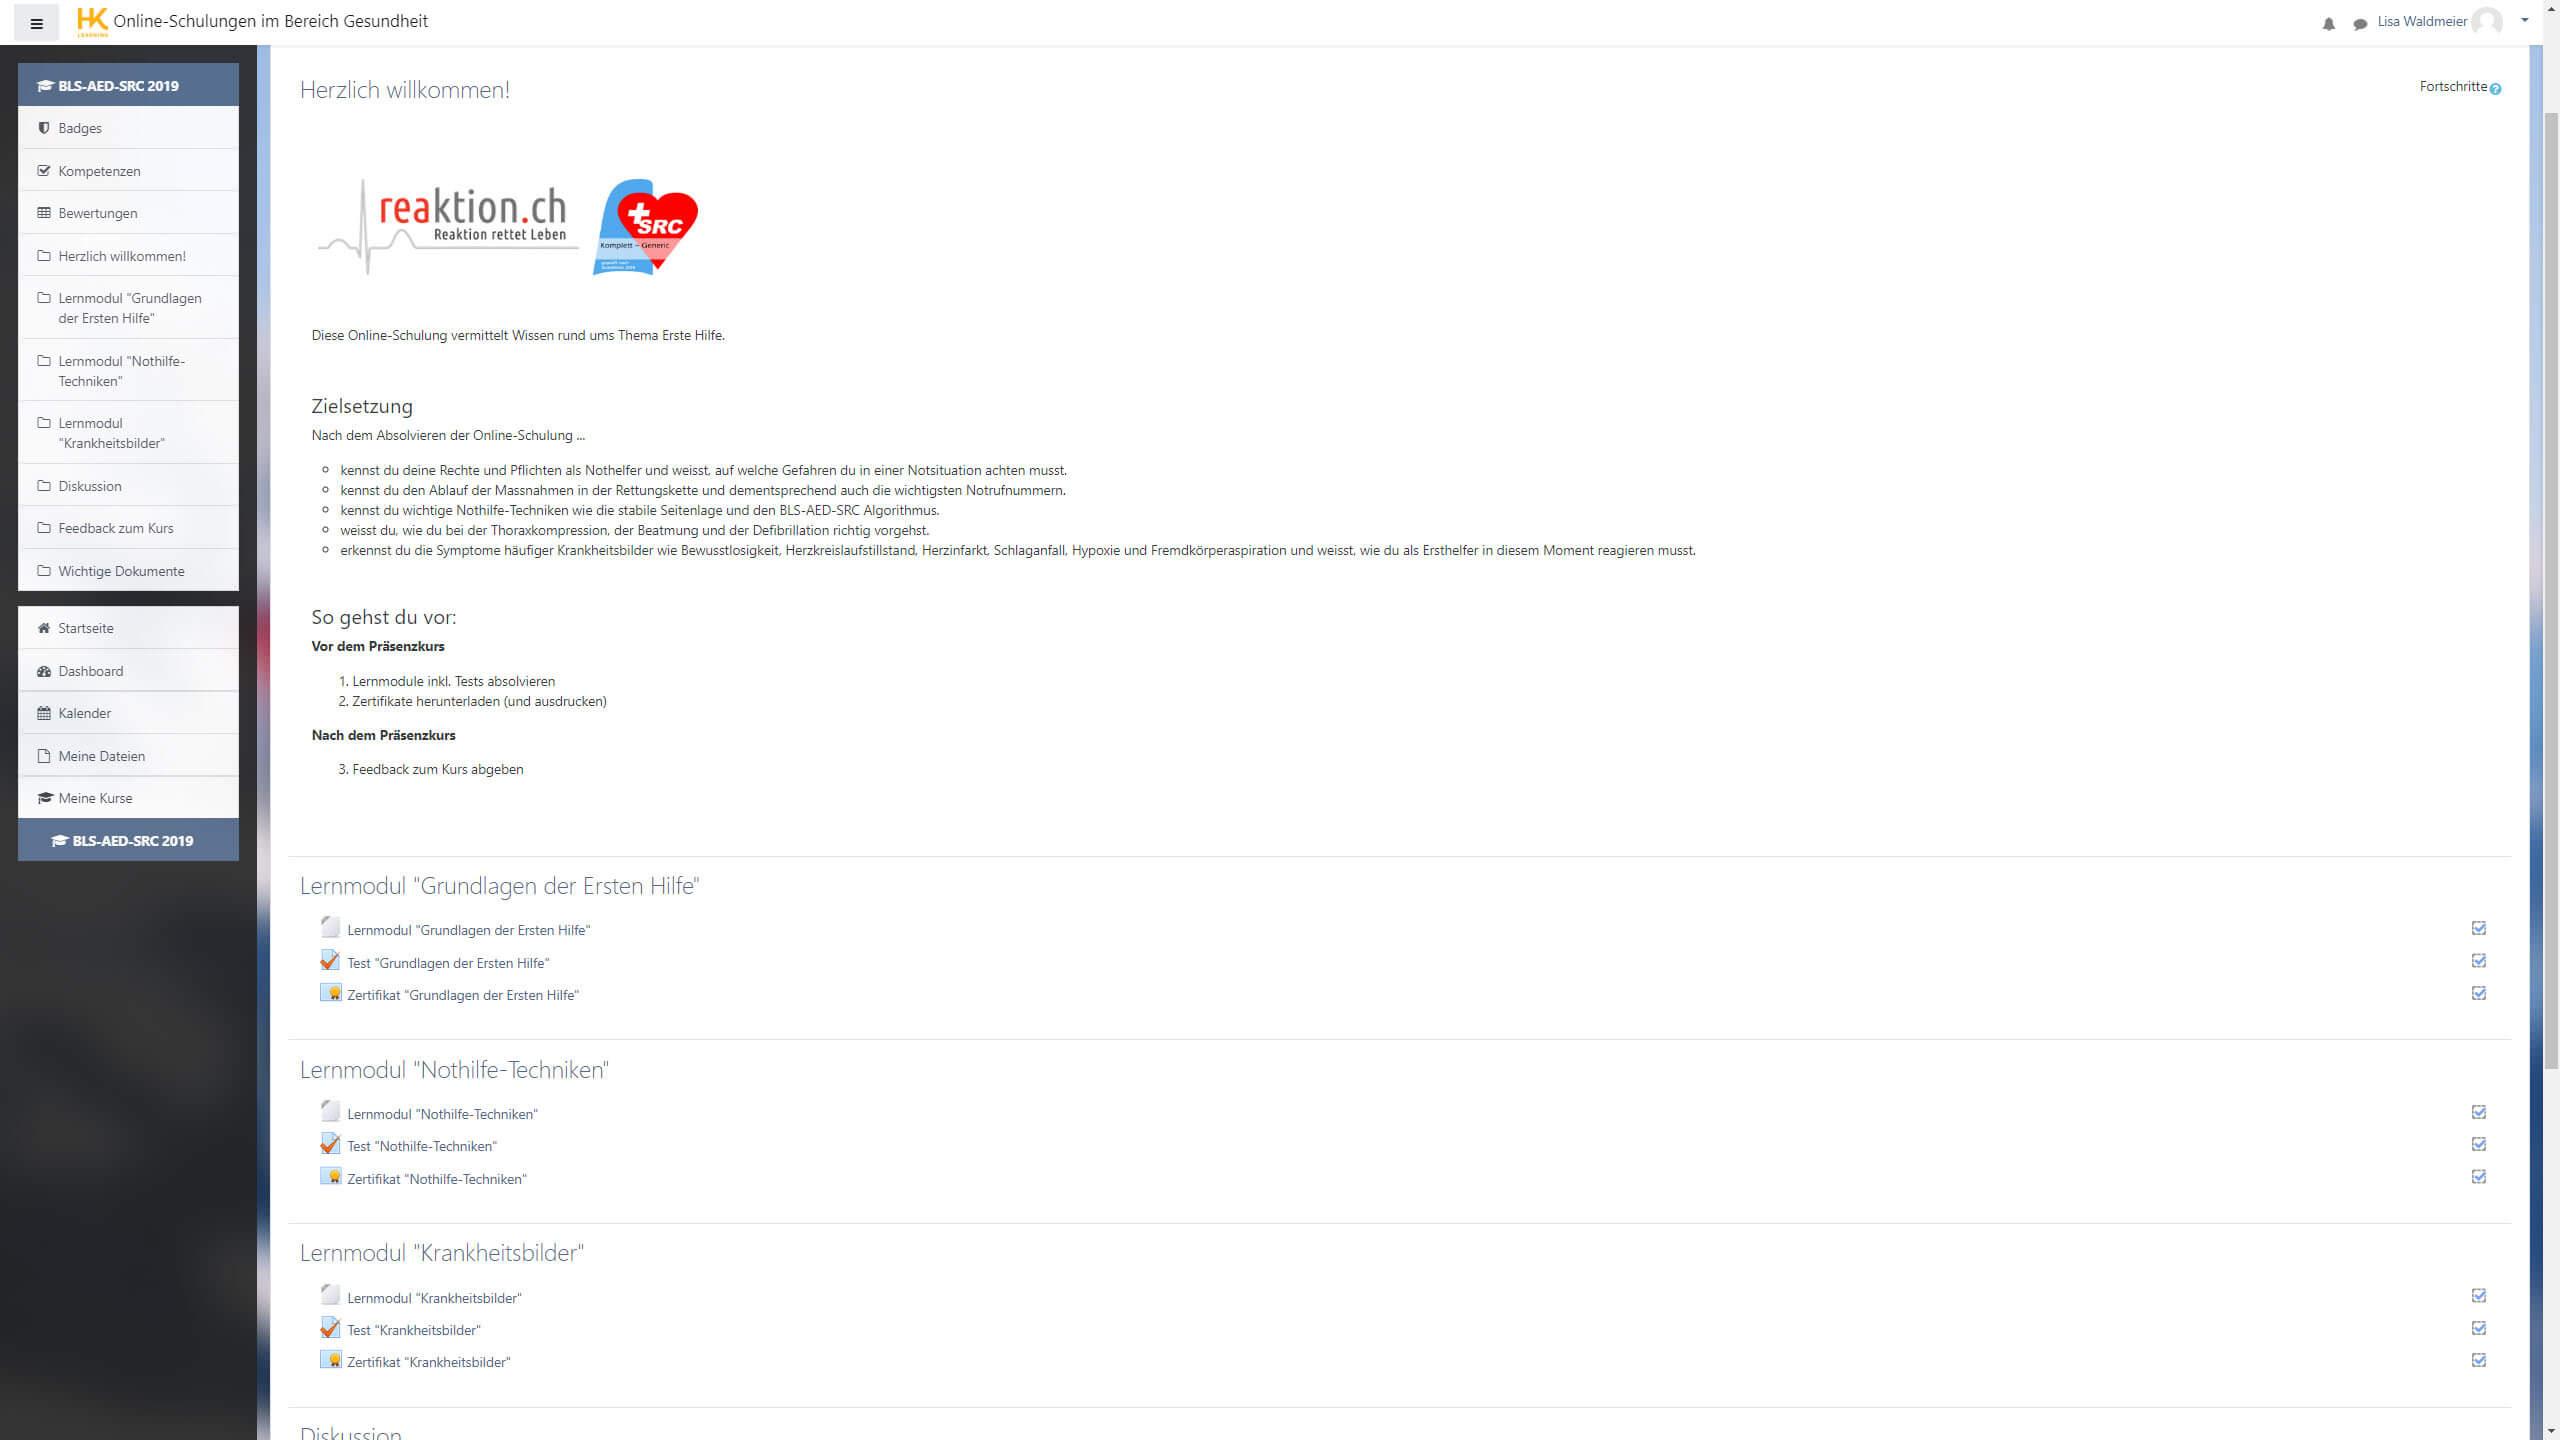 Screenshot Erste Hilfe Lernplattform